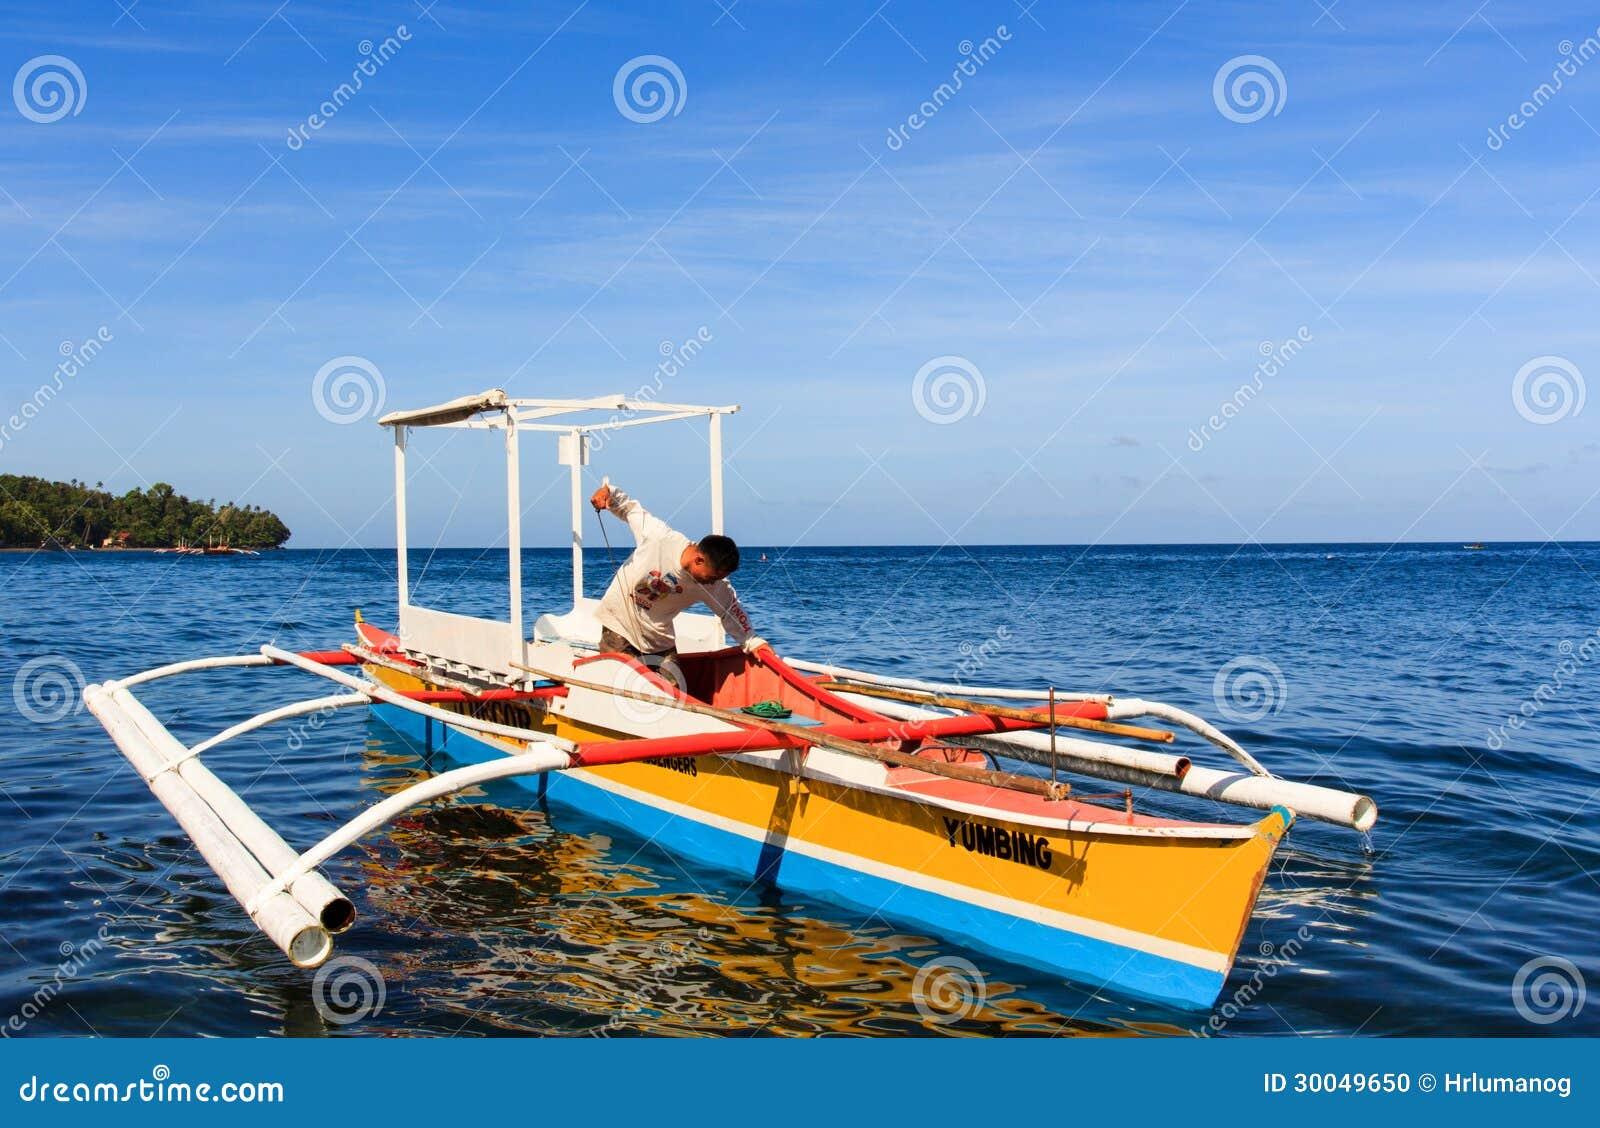 outrigger canoe called bangka in camiguin island editorial image